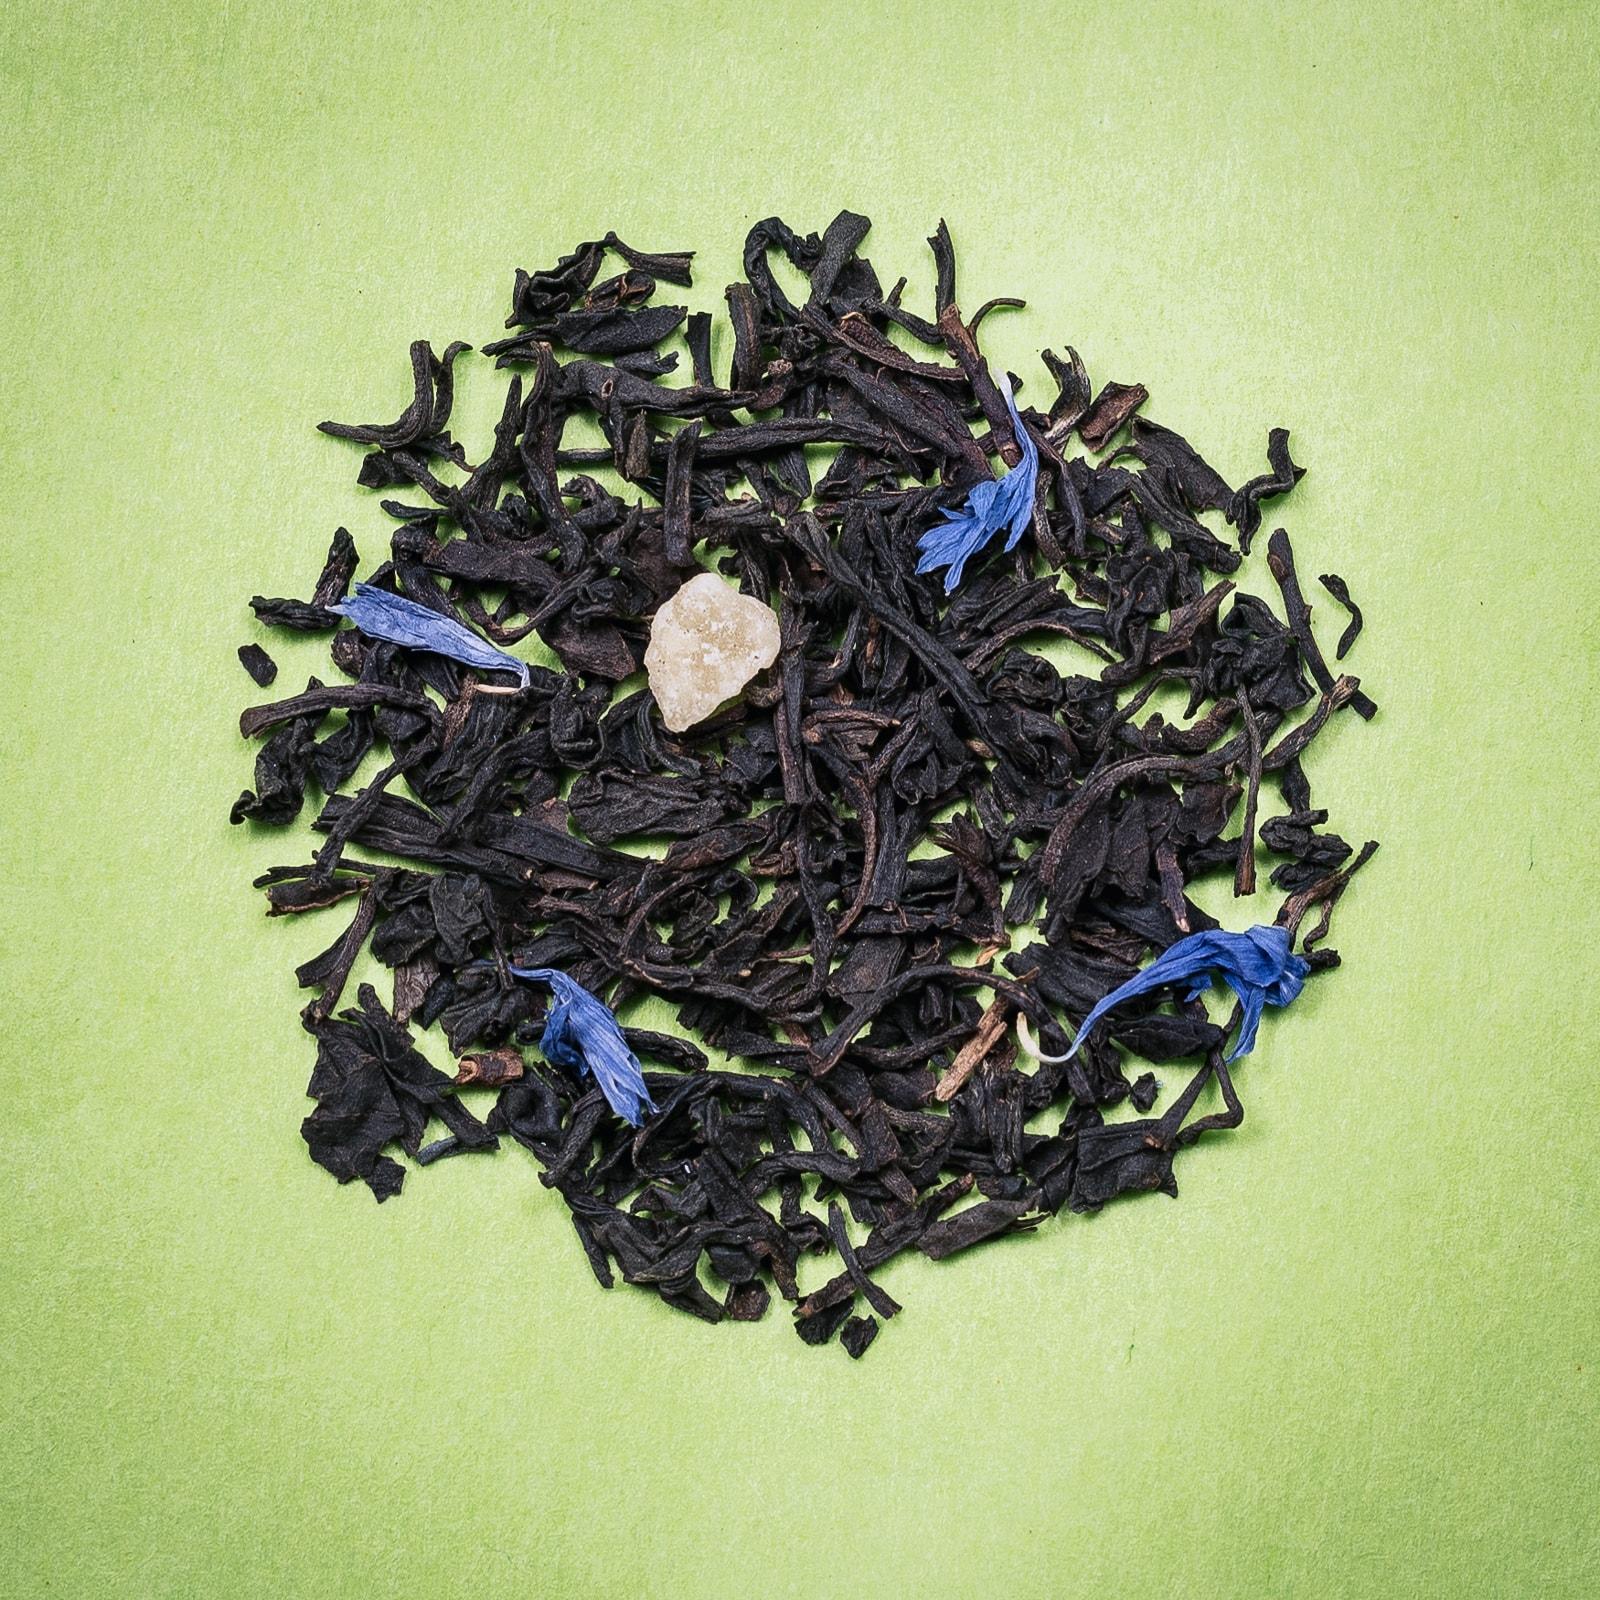 Anbassa-artisan-torrefacteur-the-noir-aromatise-Mangoustan-GUP